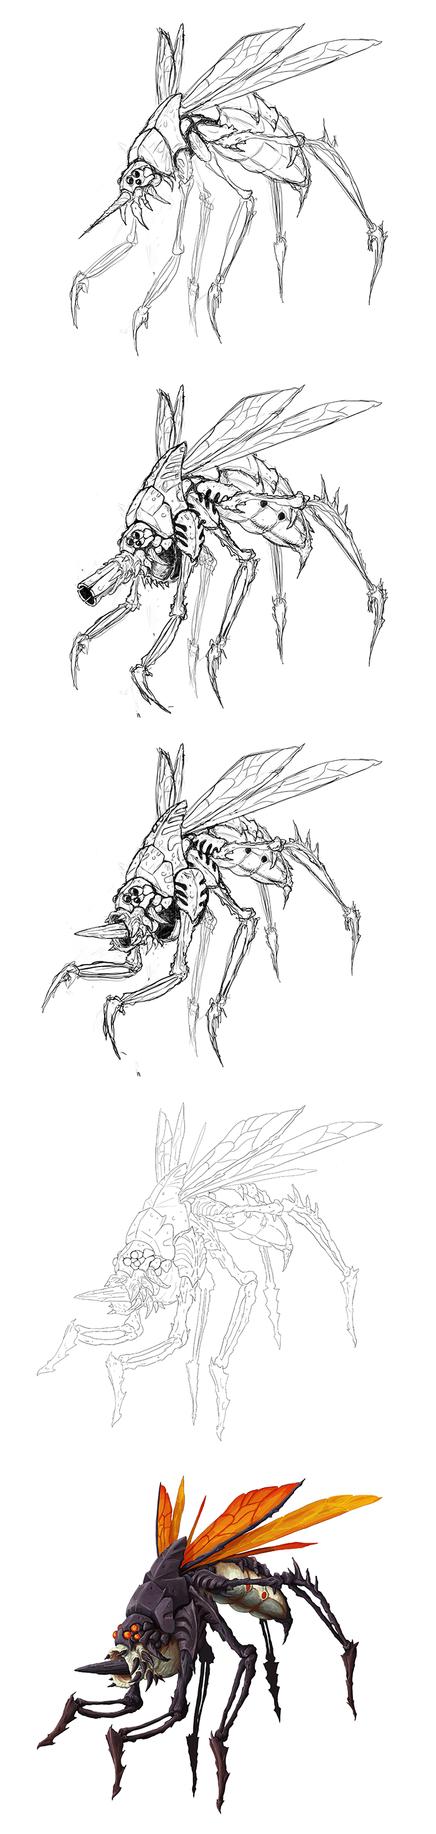 mosquito by masacrar